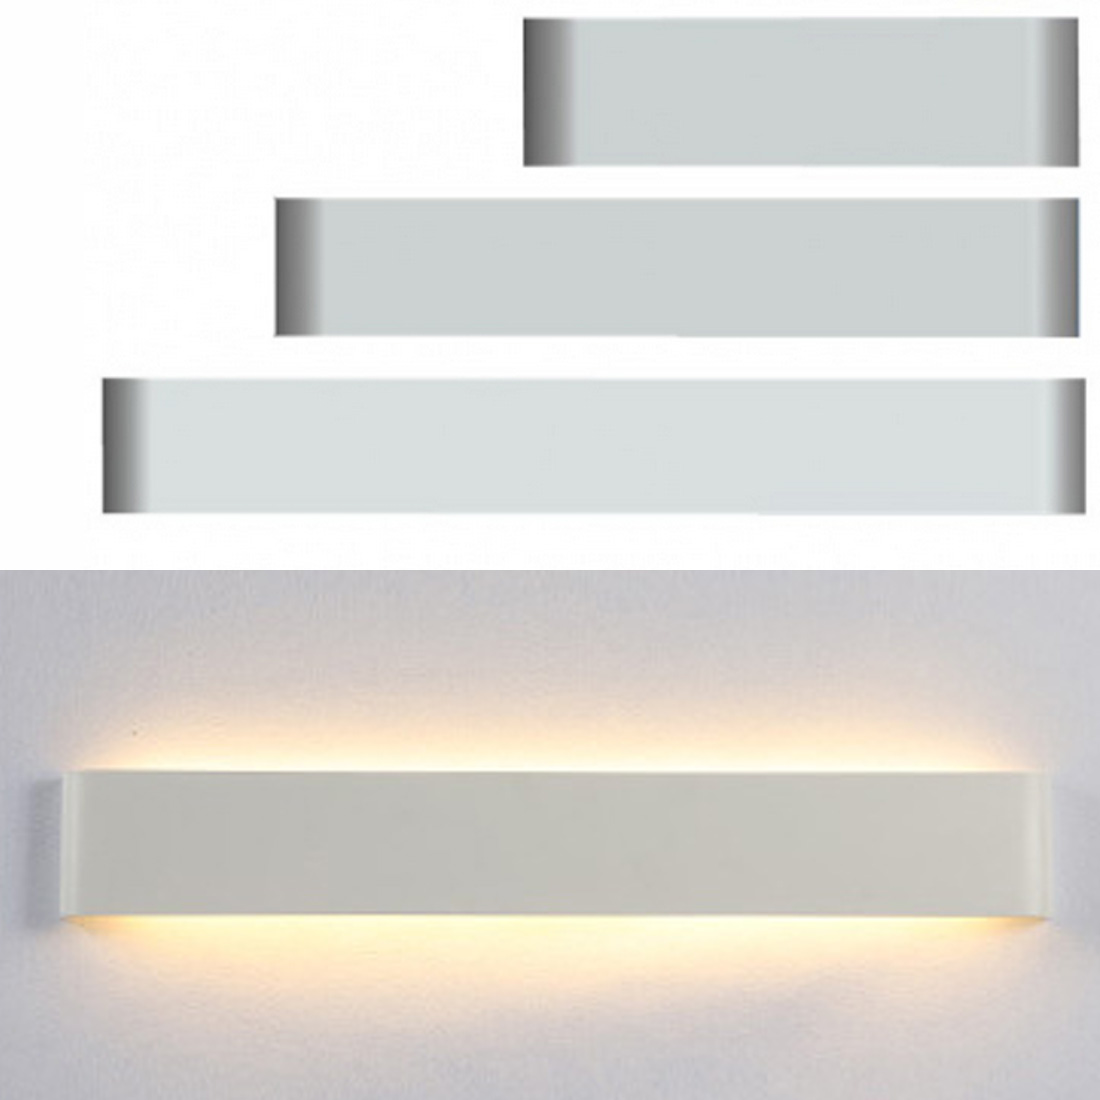 Silver/Black Modern Minimalist LED Aluminum Lamp Bedside Lamp Wall Lamp for Room Bathroom Mirror Light Direct Creative Aisle modern minimalist waterproof antifog aluminum acryl long led mirror light for bathroom cabinet aisle wall lamp 35 48 61cm 1134